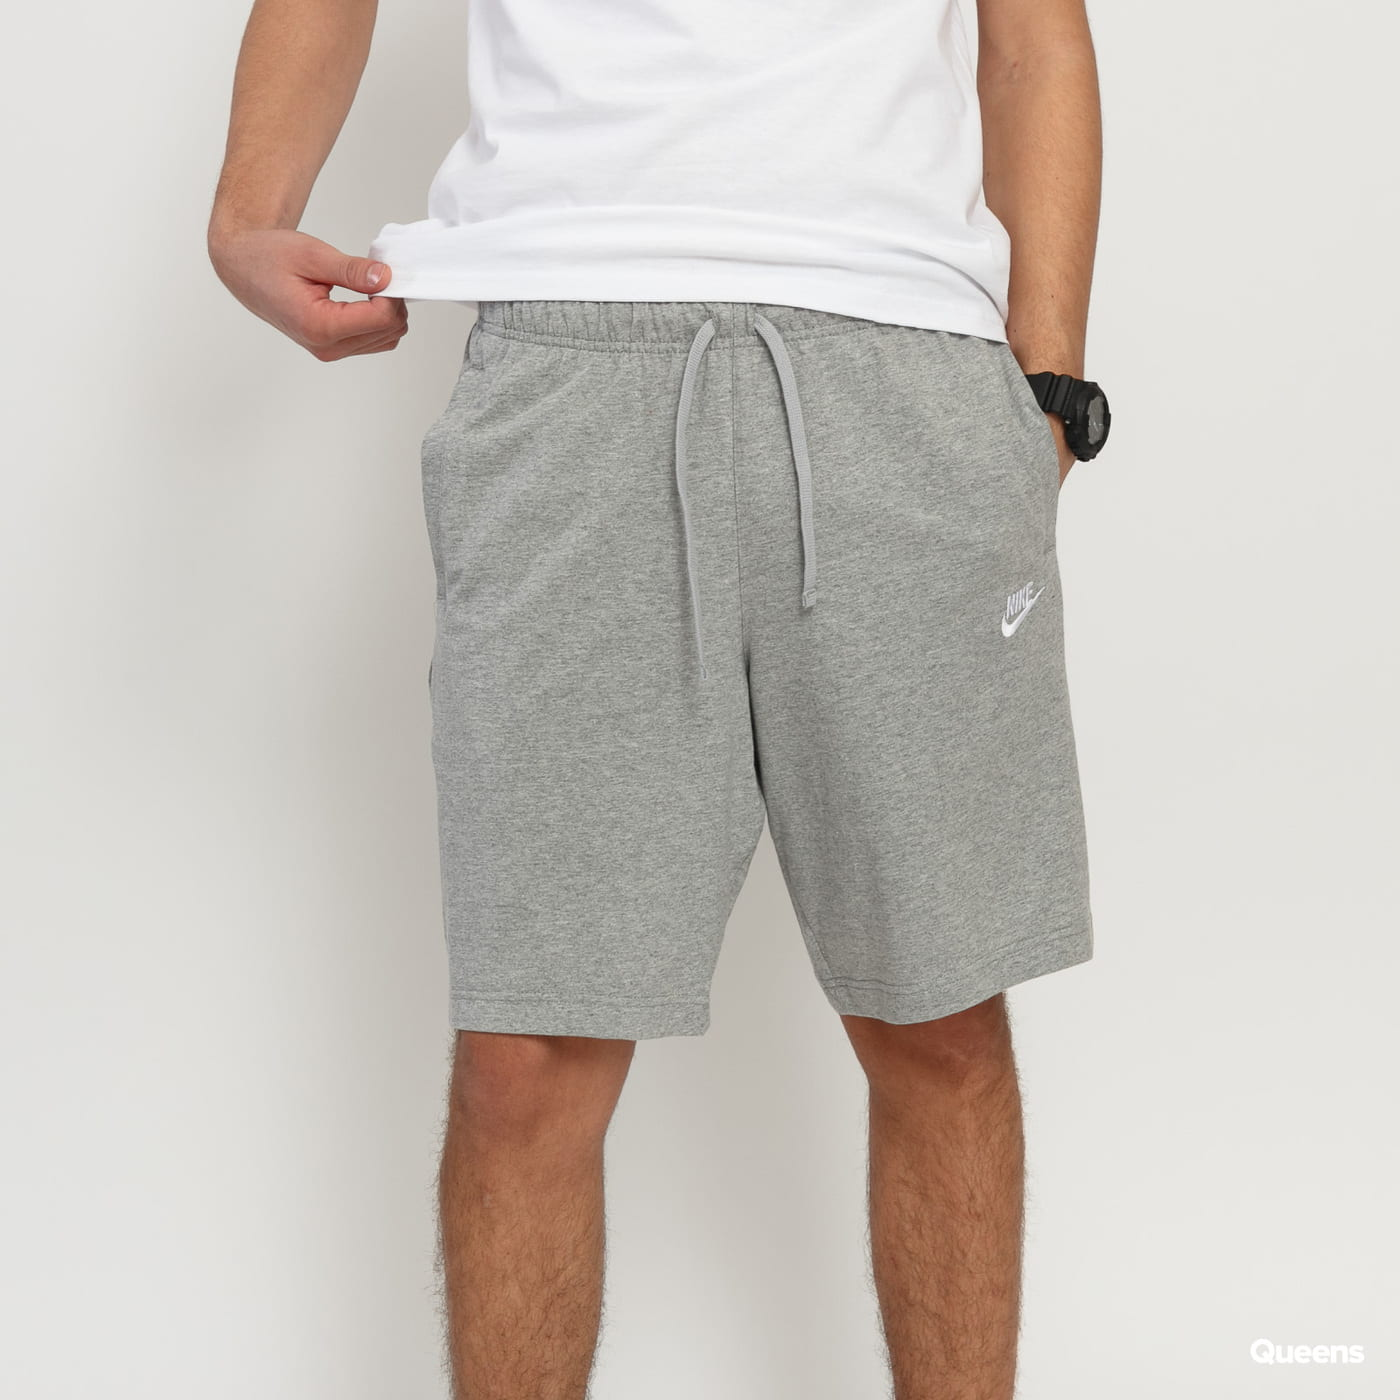 Nike M NSW Club Short Jersey grau meliert